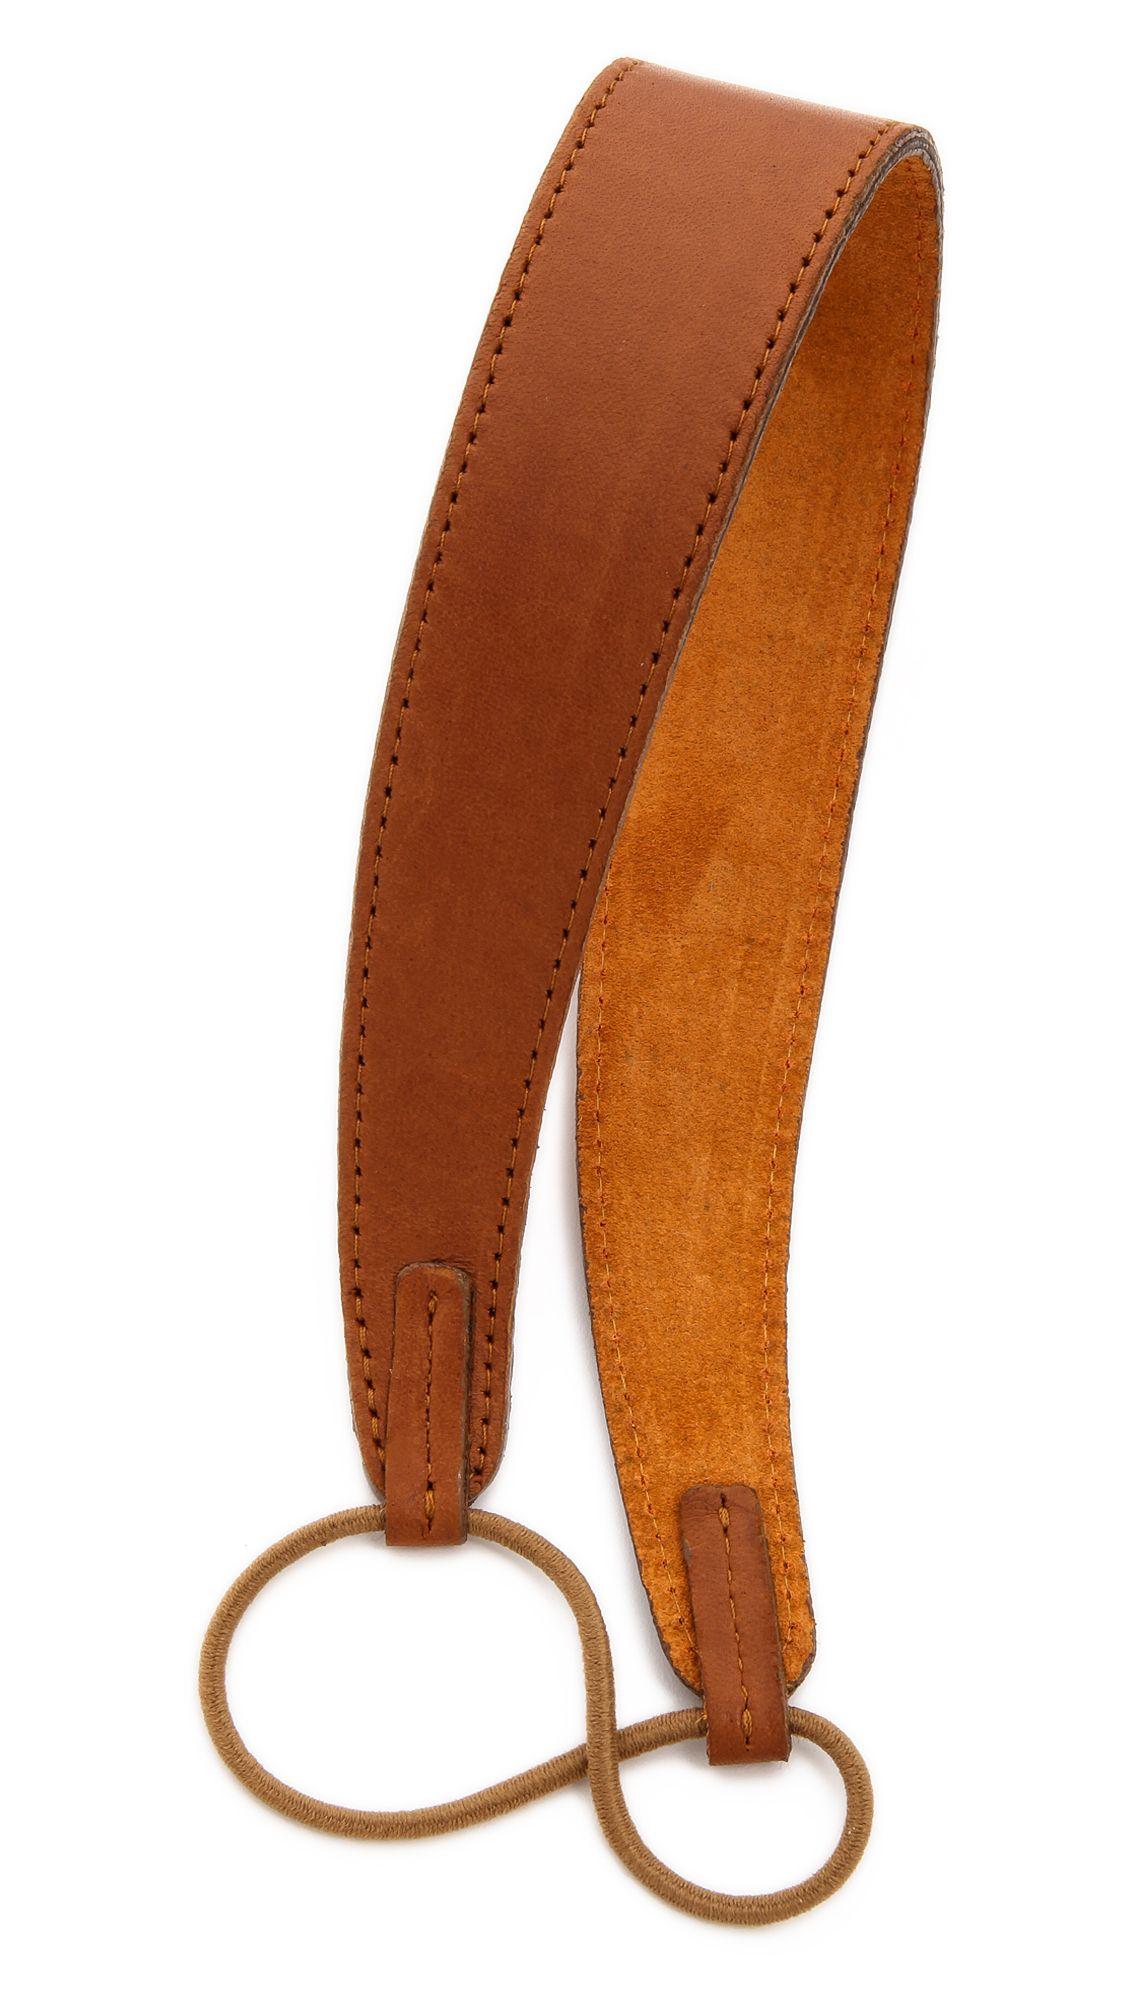 Womenus brown leather headband black headband pinterest